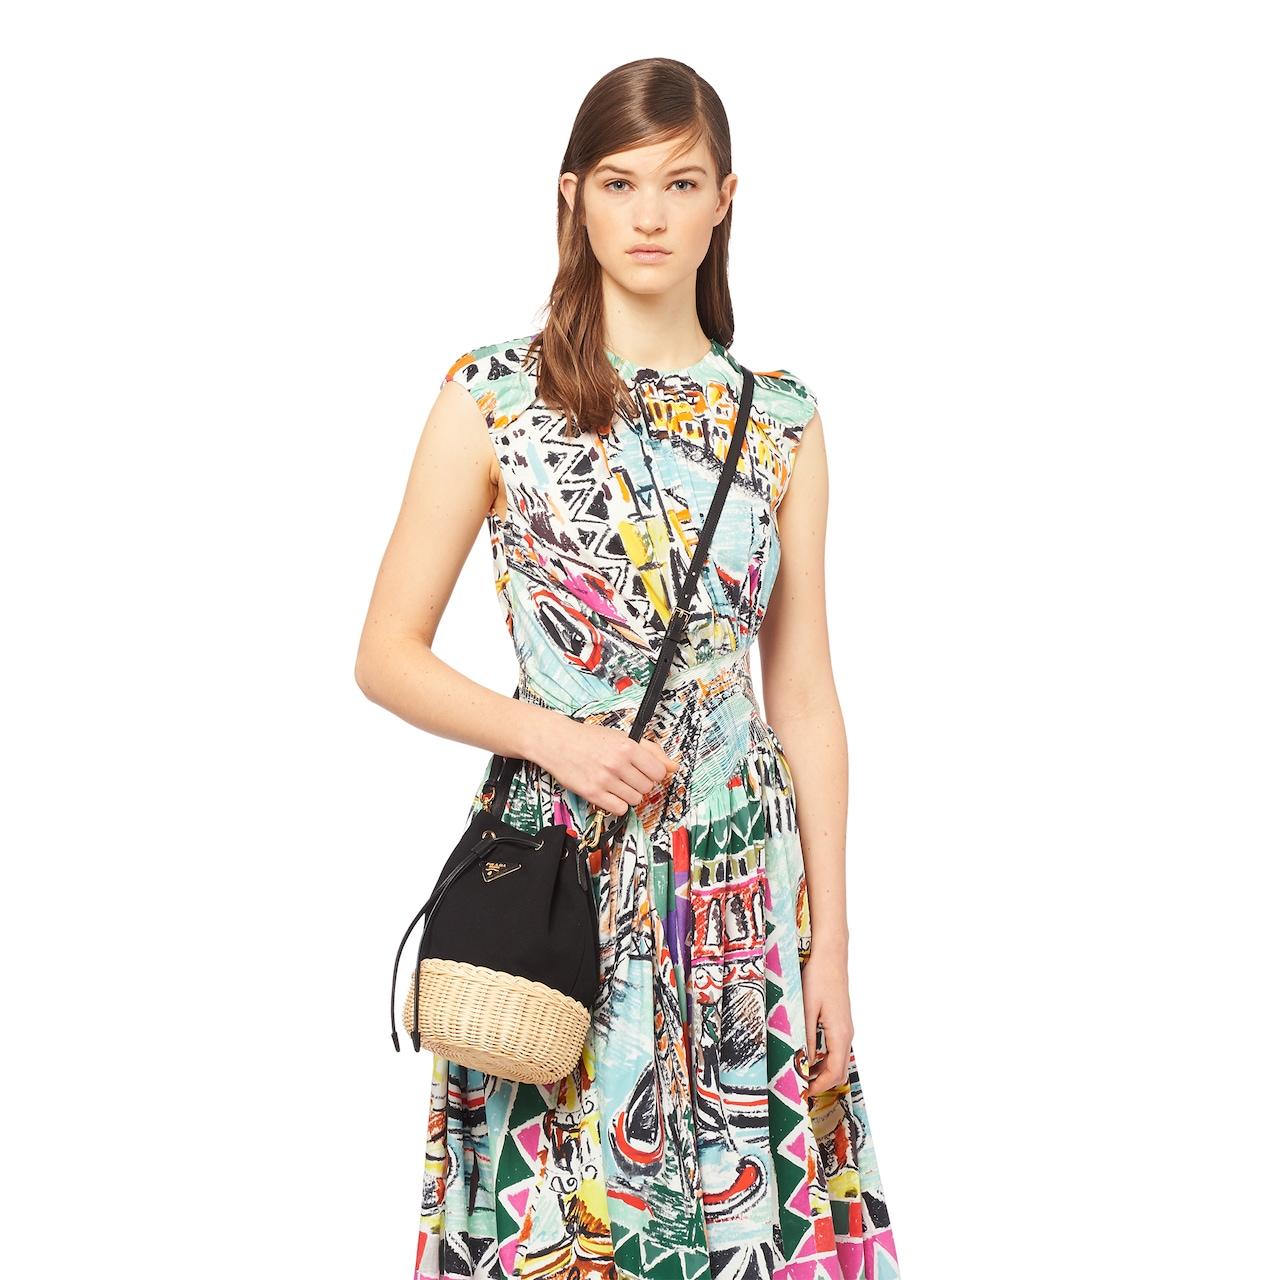 Wicker and canvas shoulder bag